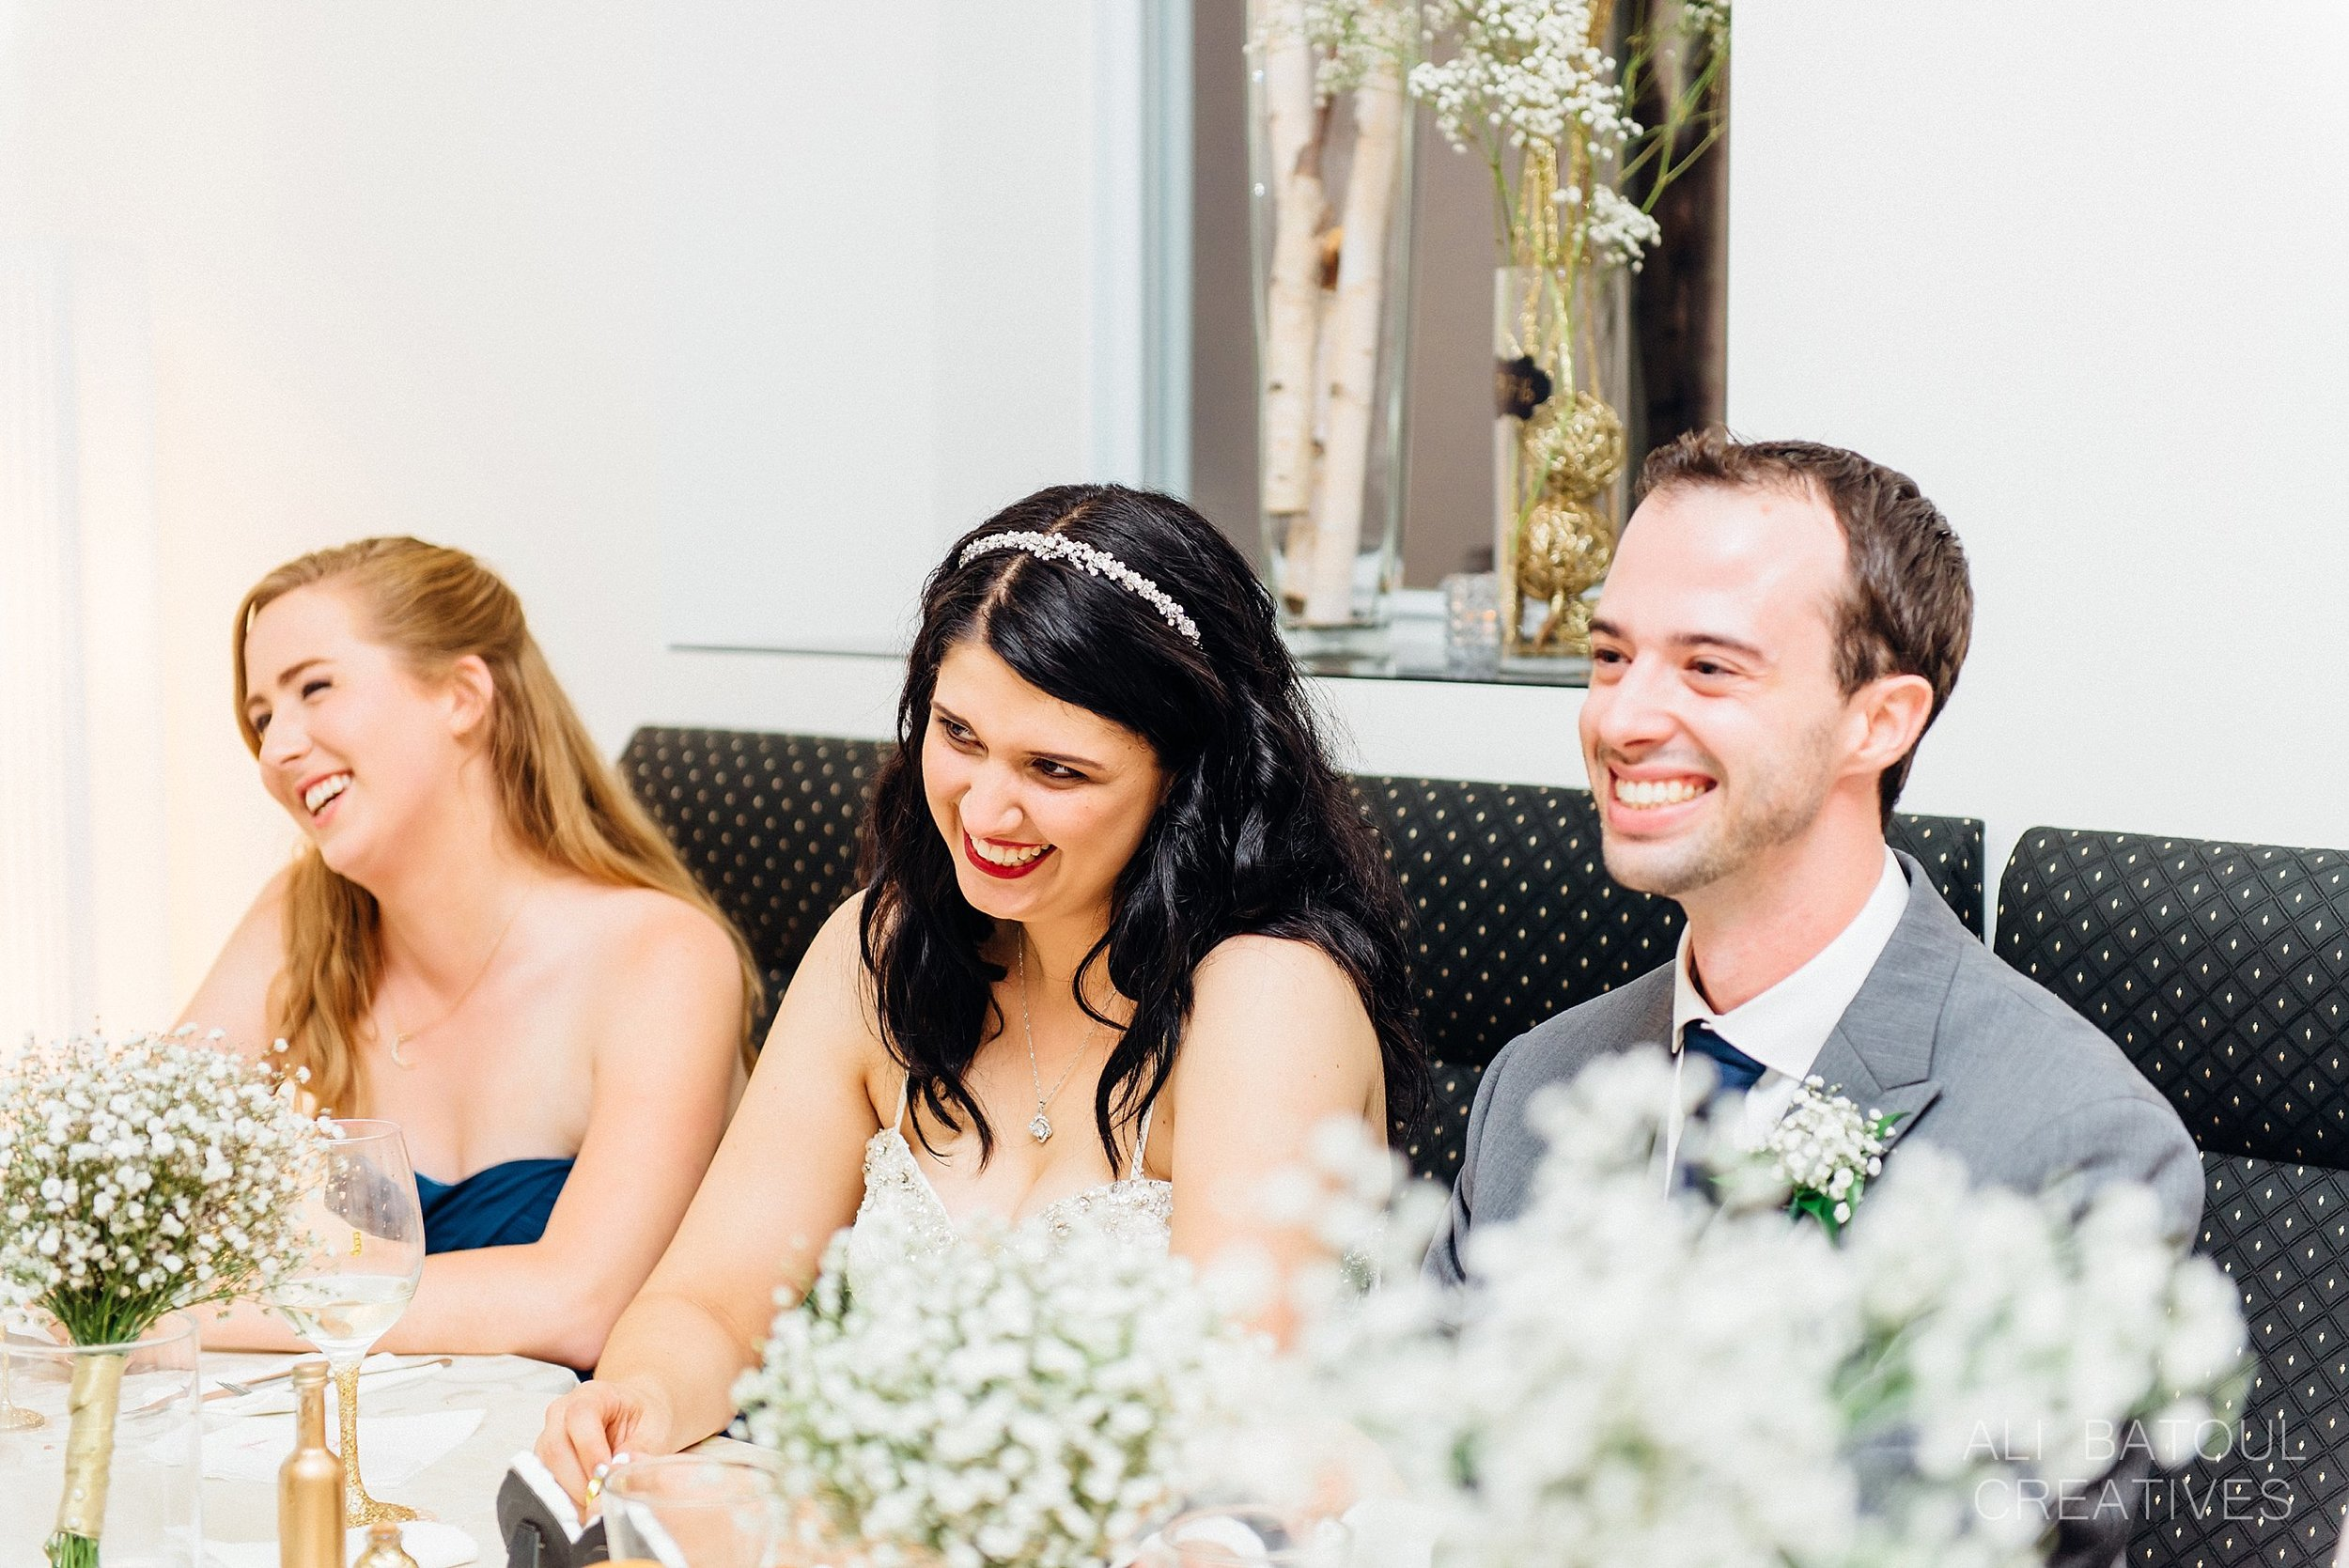 Jocelyn + Steve At The Schoolhouse Wedding - Ali and Batoul Fine Art Wedding Photography_0095.jpg